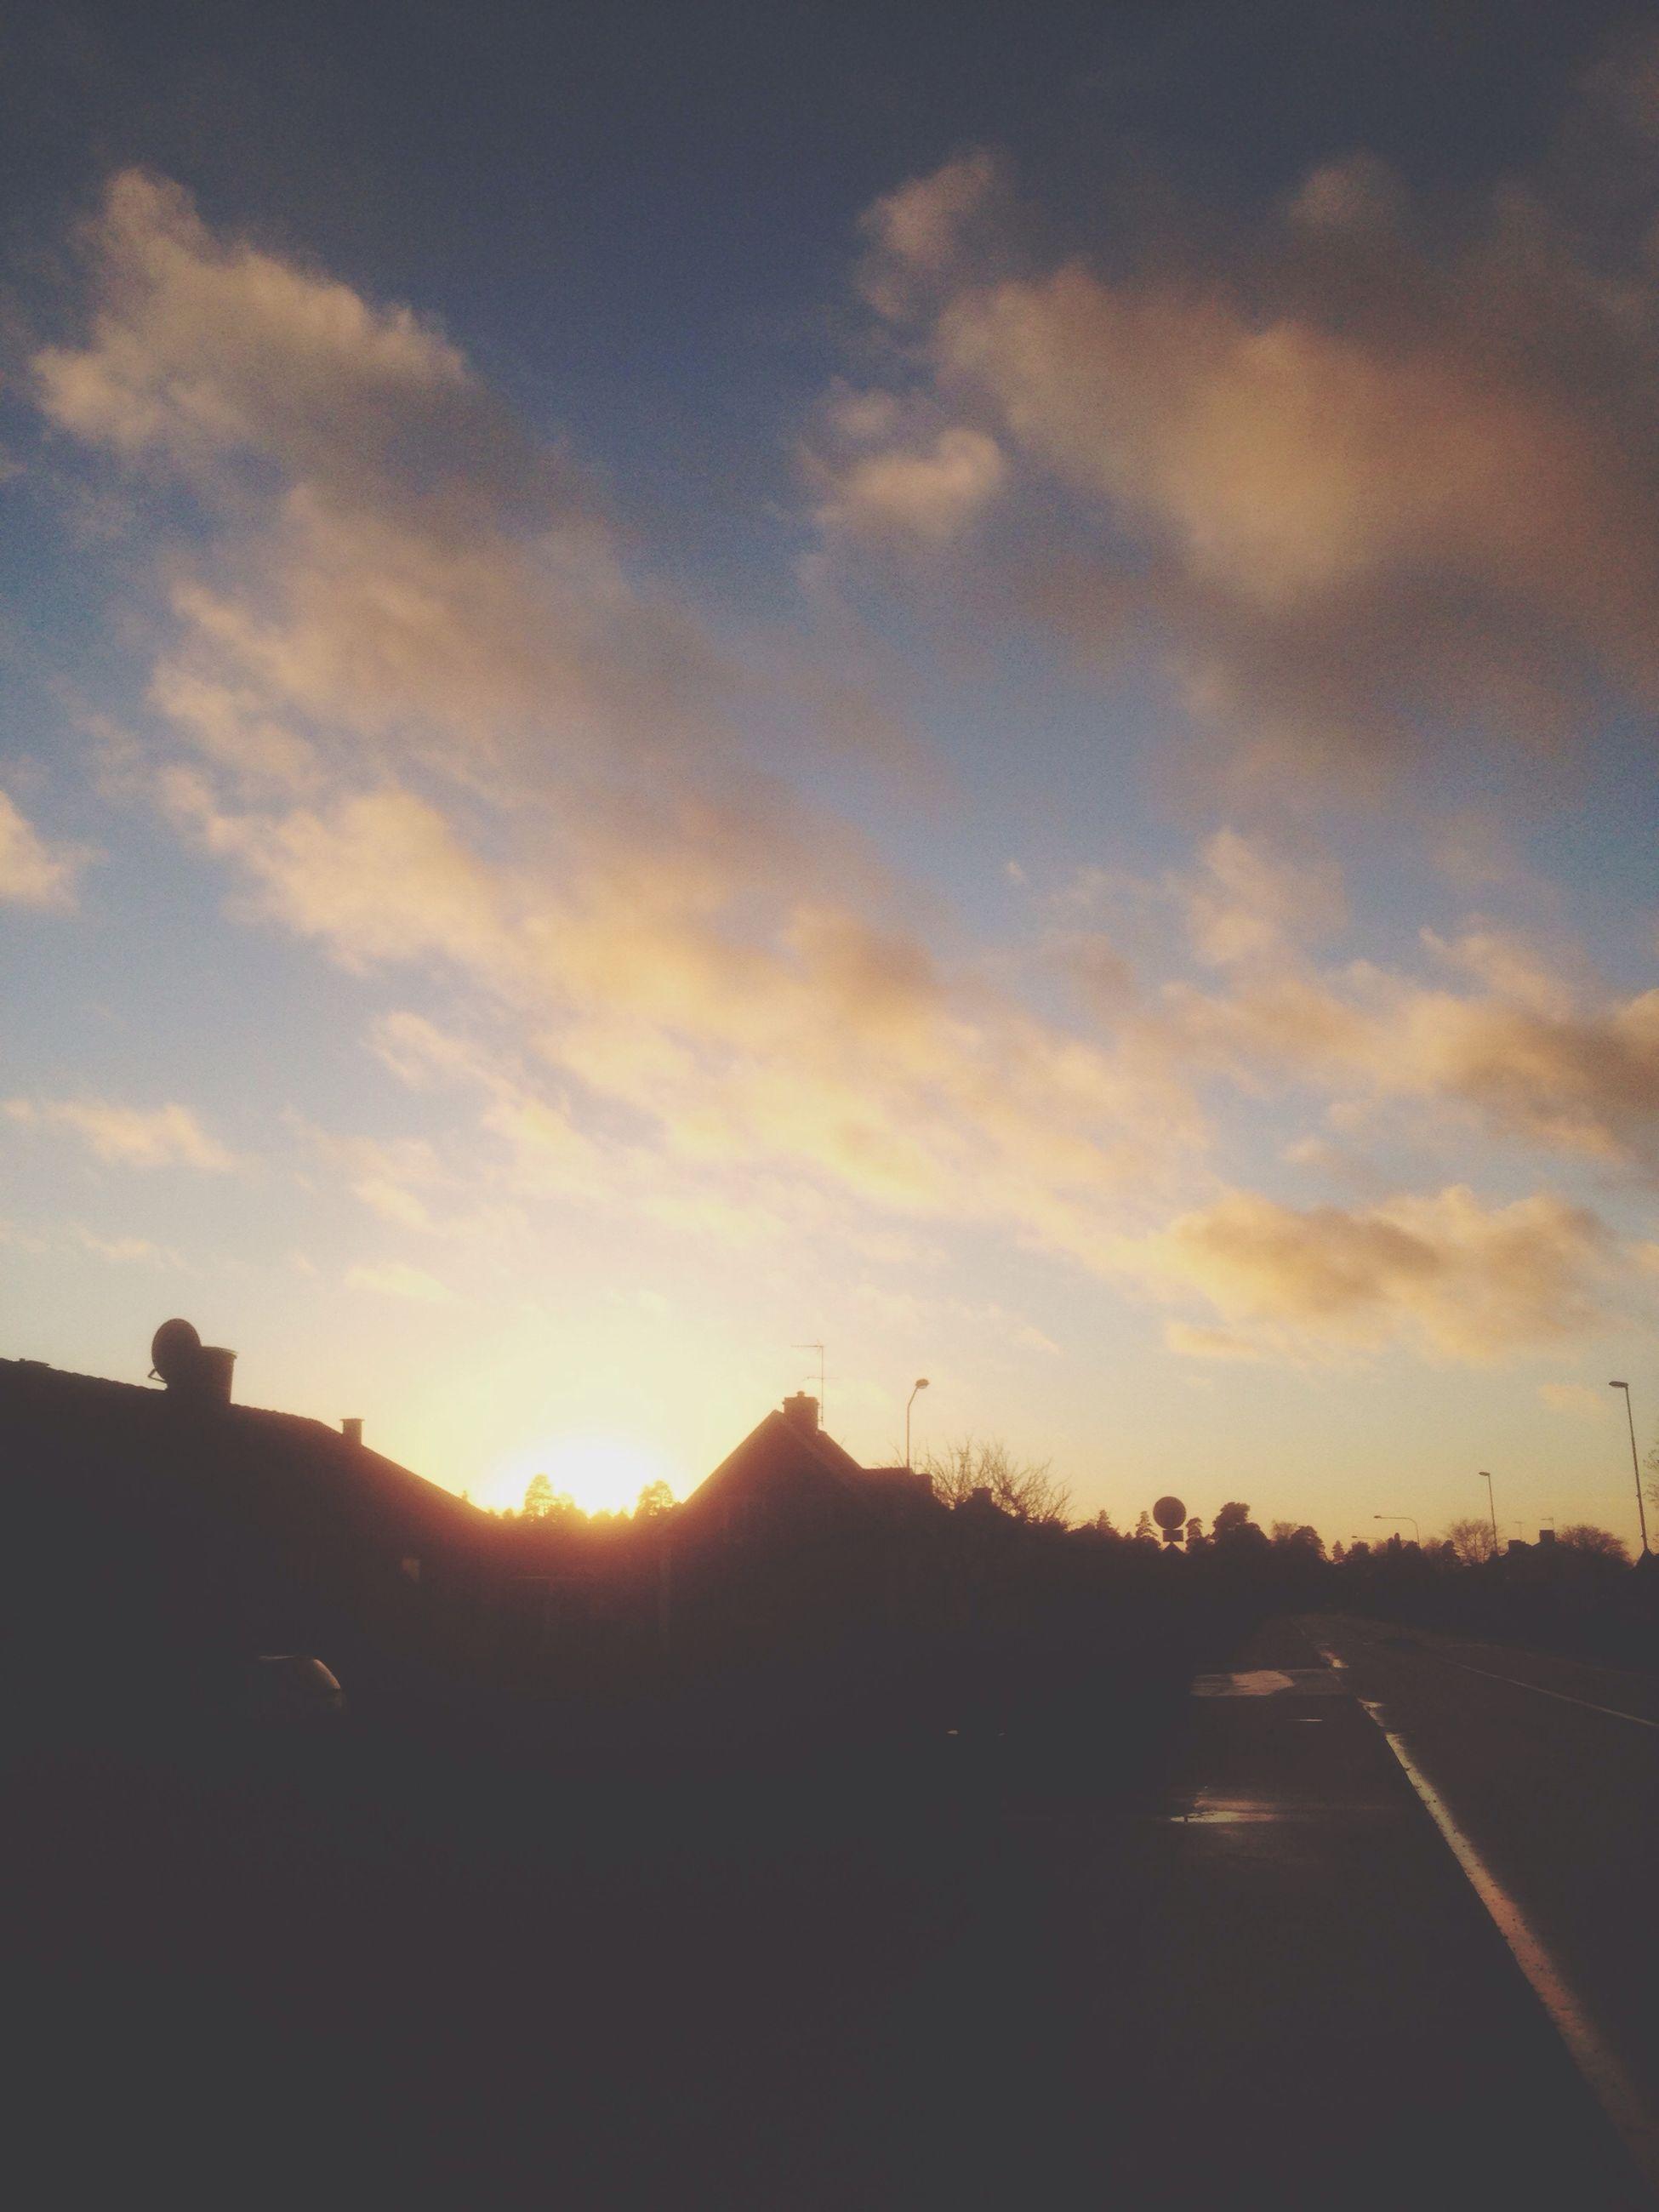 sunset, sky, sun, road, silhouette, scenics, transportation, landscape, tranquility, tranquil scene, sunlight, beauty in nature, cloud - sky, sunbeam, orange color, nature, cloud, outdoors, no people, idyllic